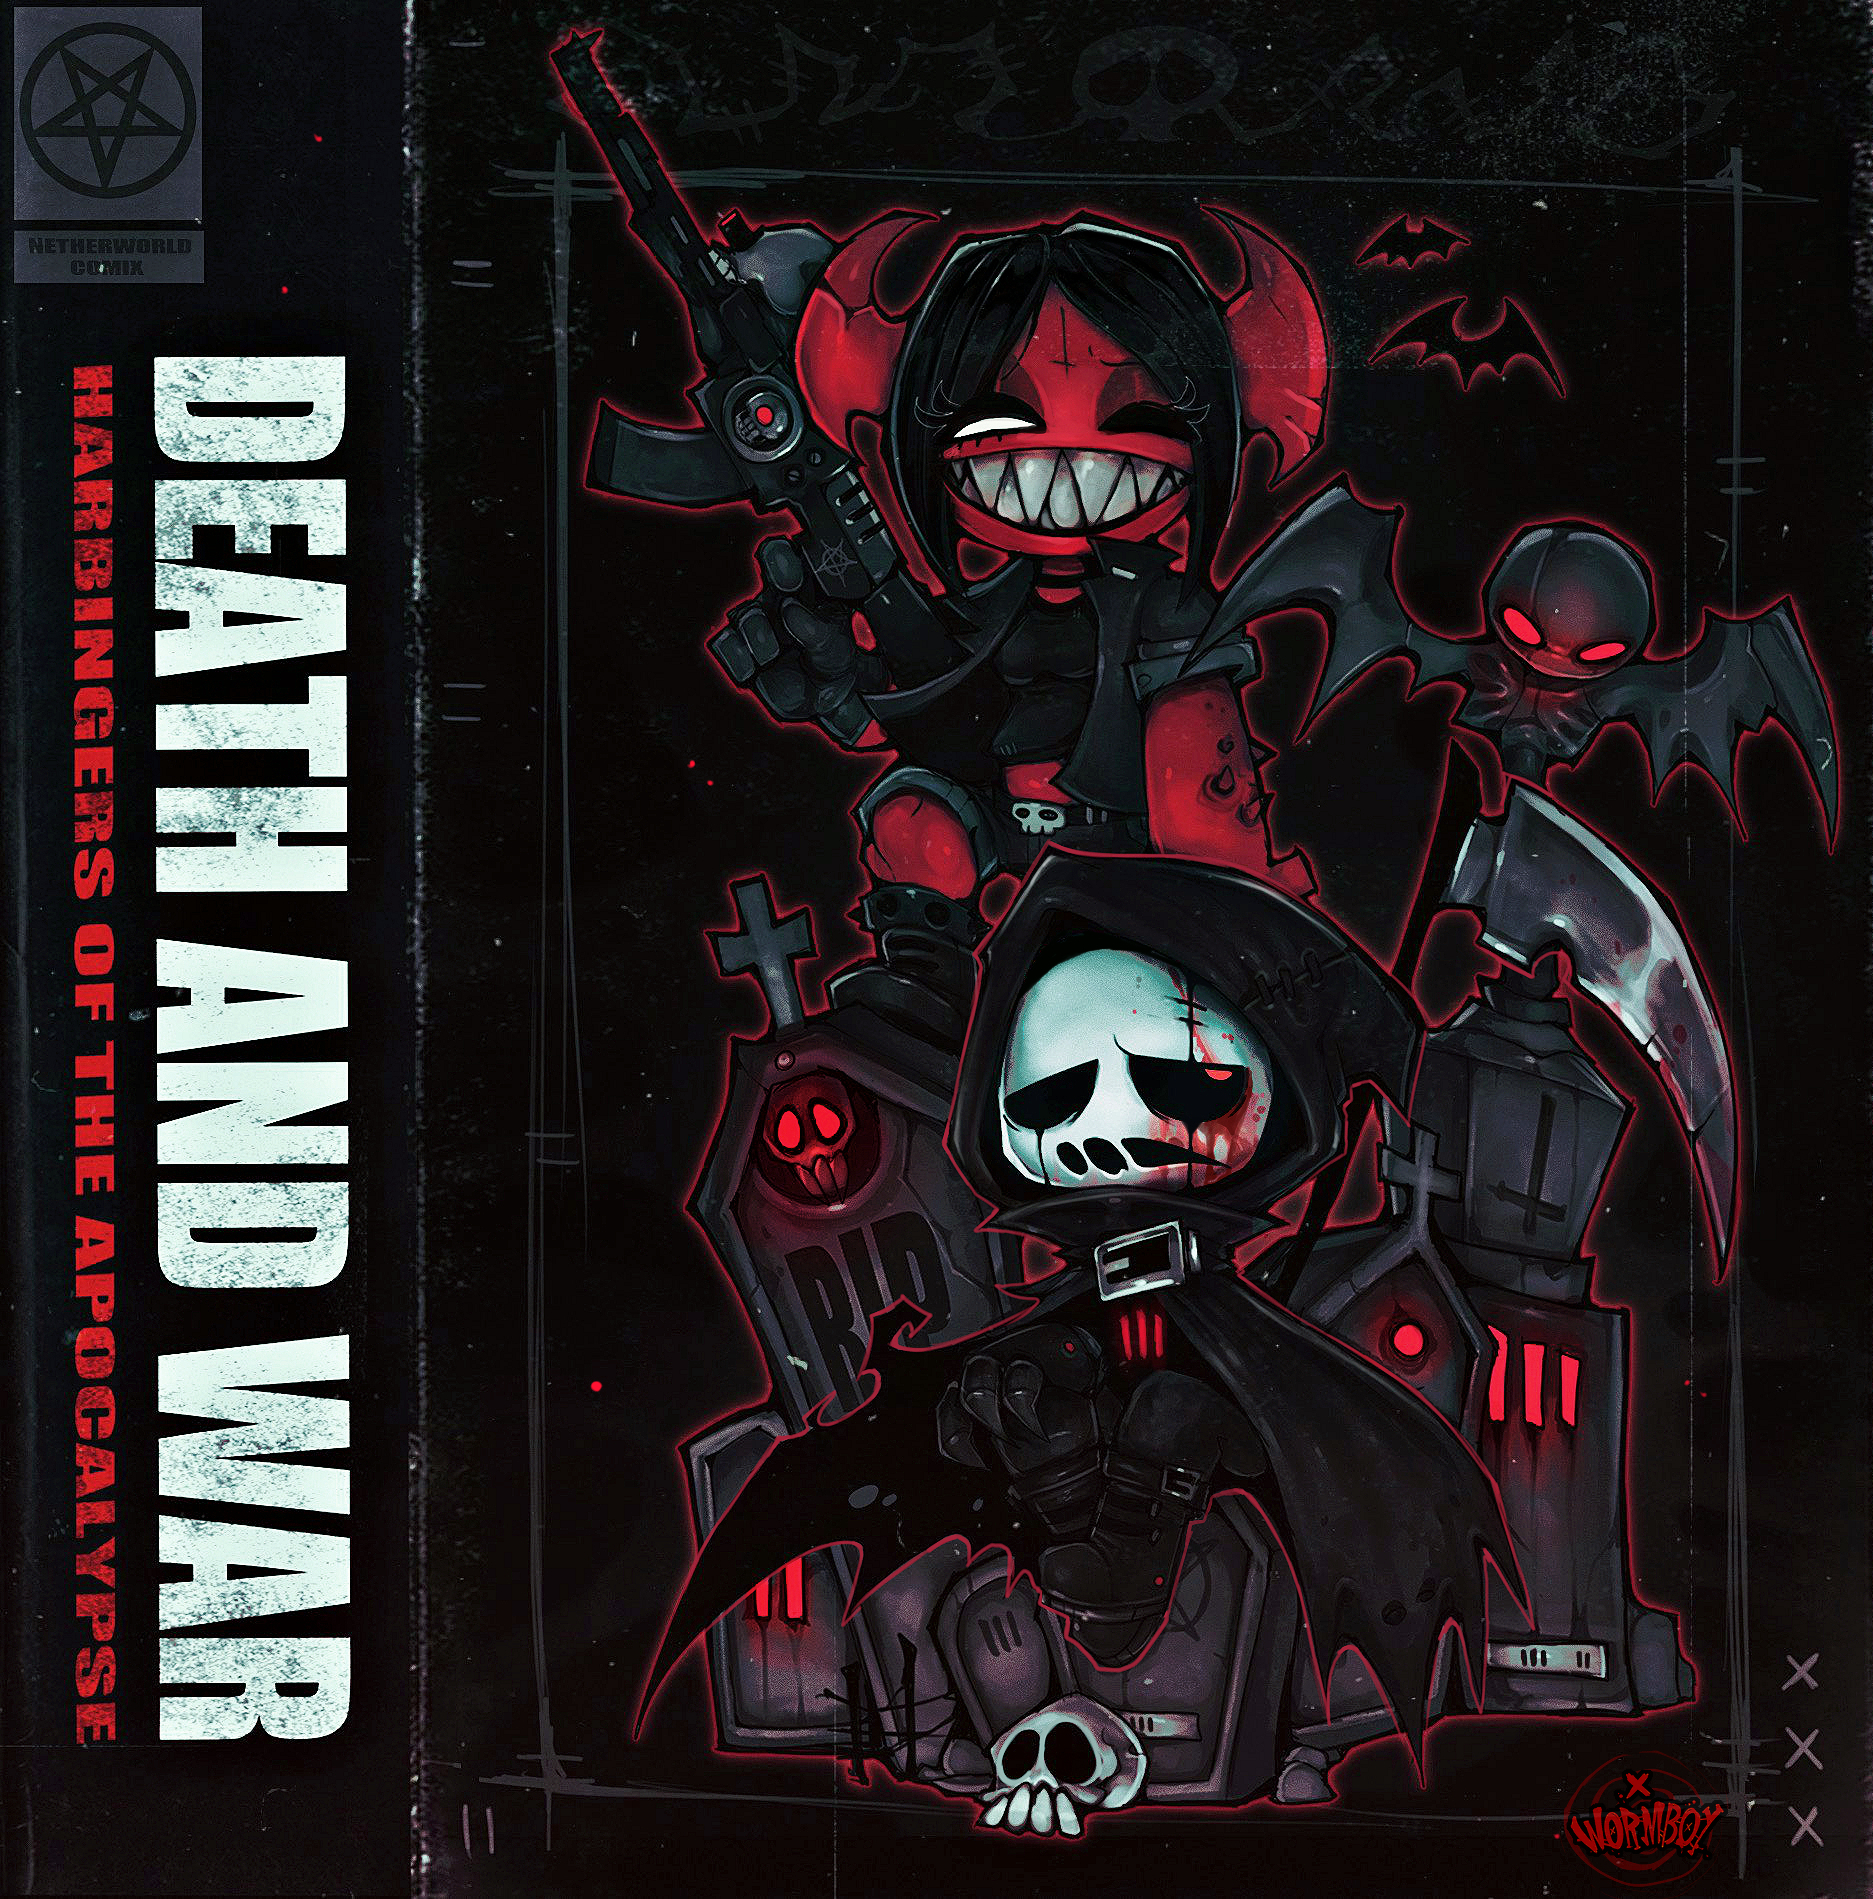 DEATH AND WAR (199X)